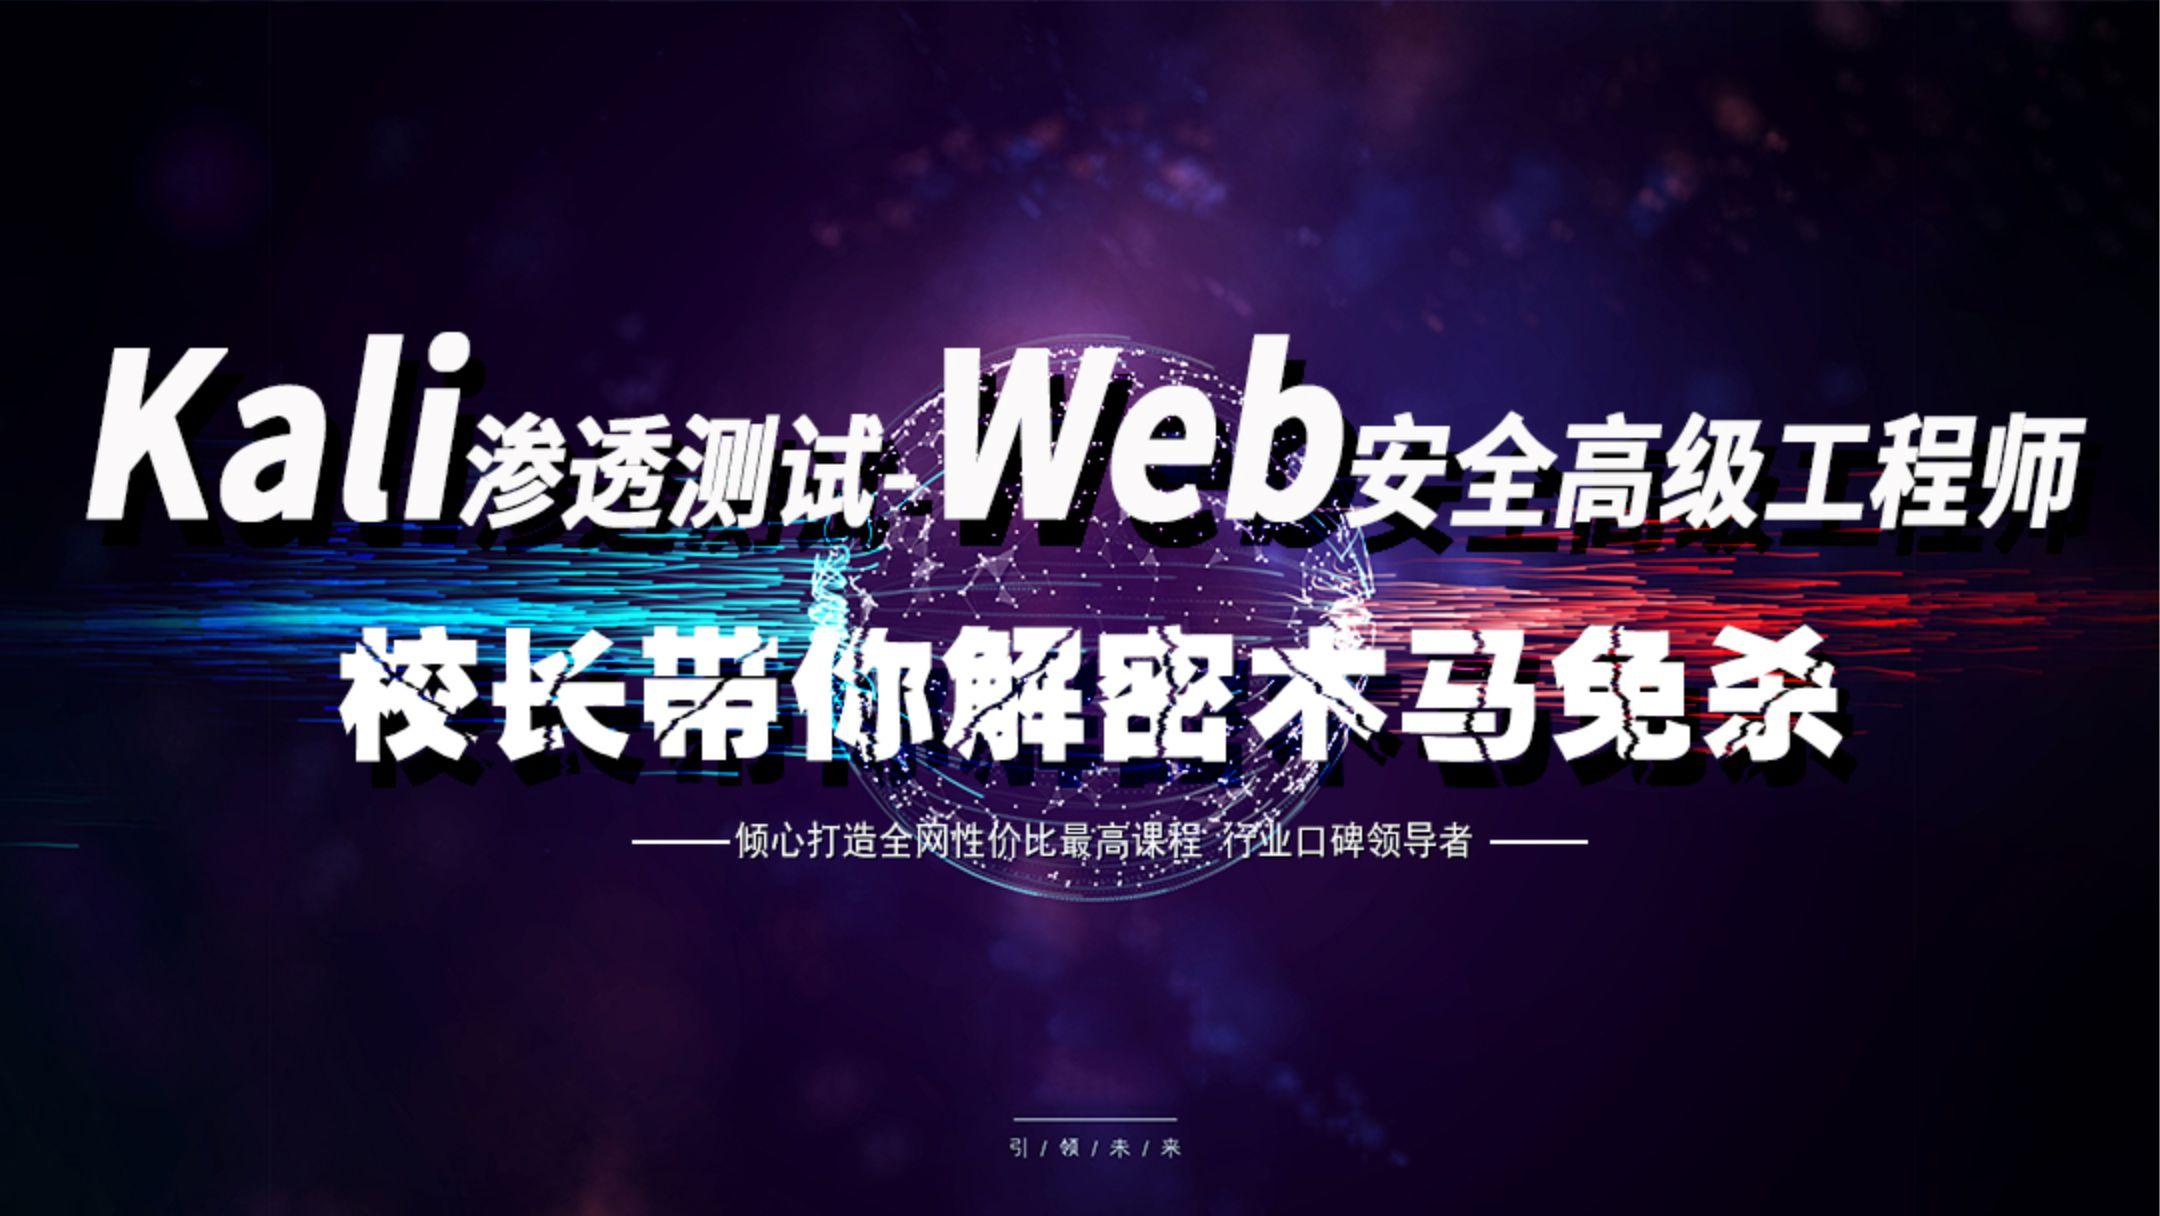 kali渗透测试/web安全/白帽子黑客/网络安全/无线安全/木马免杀